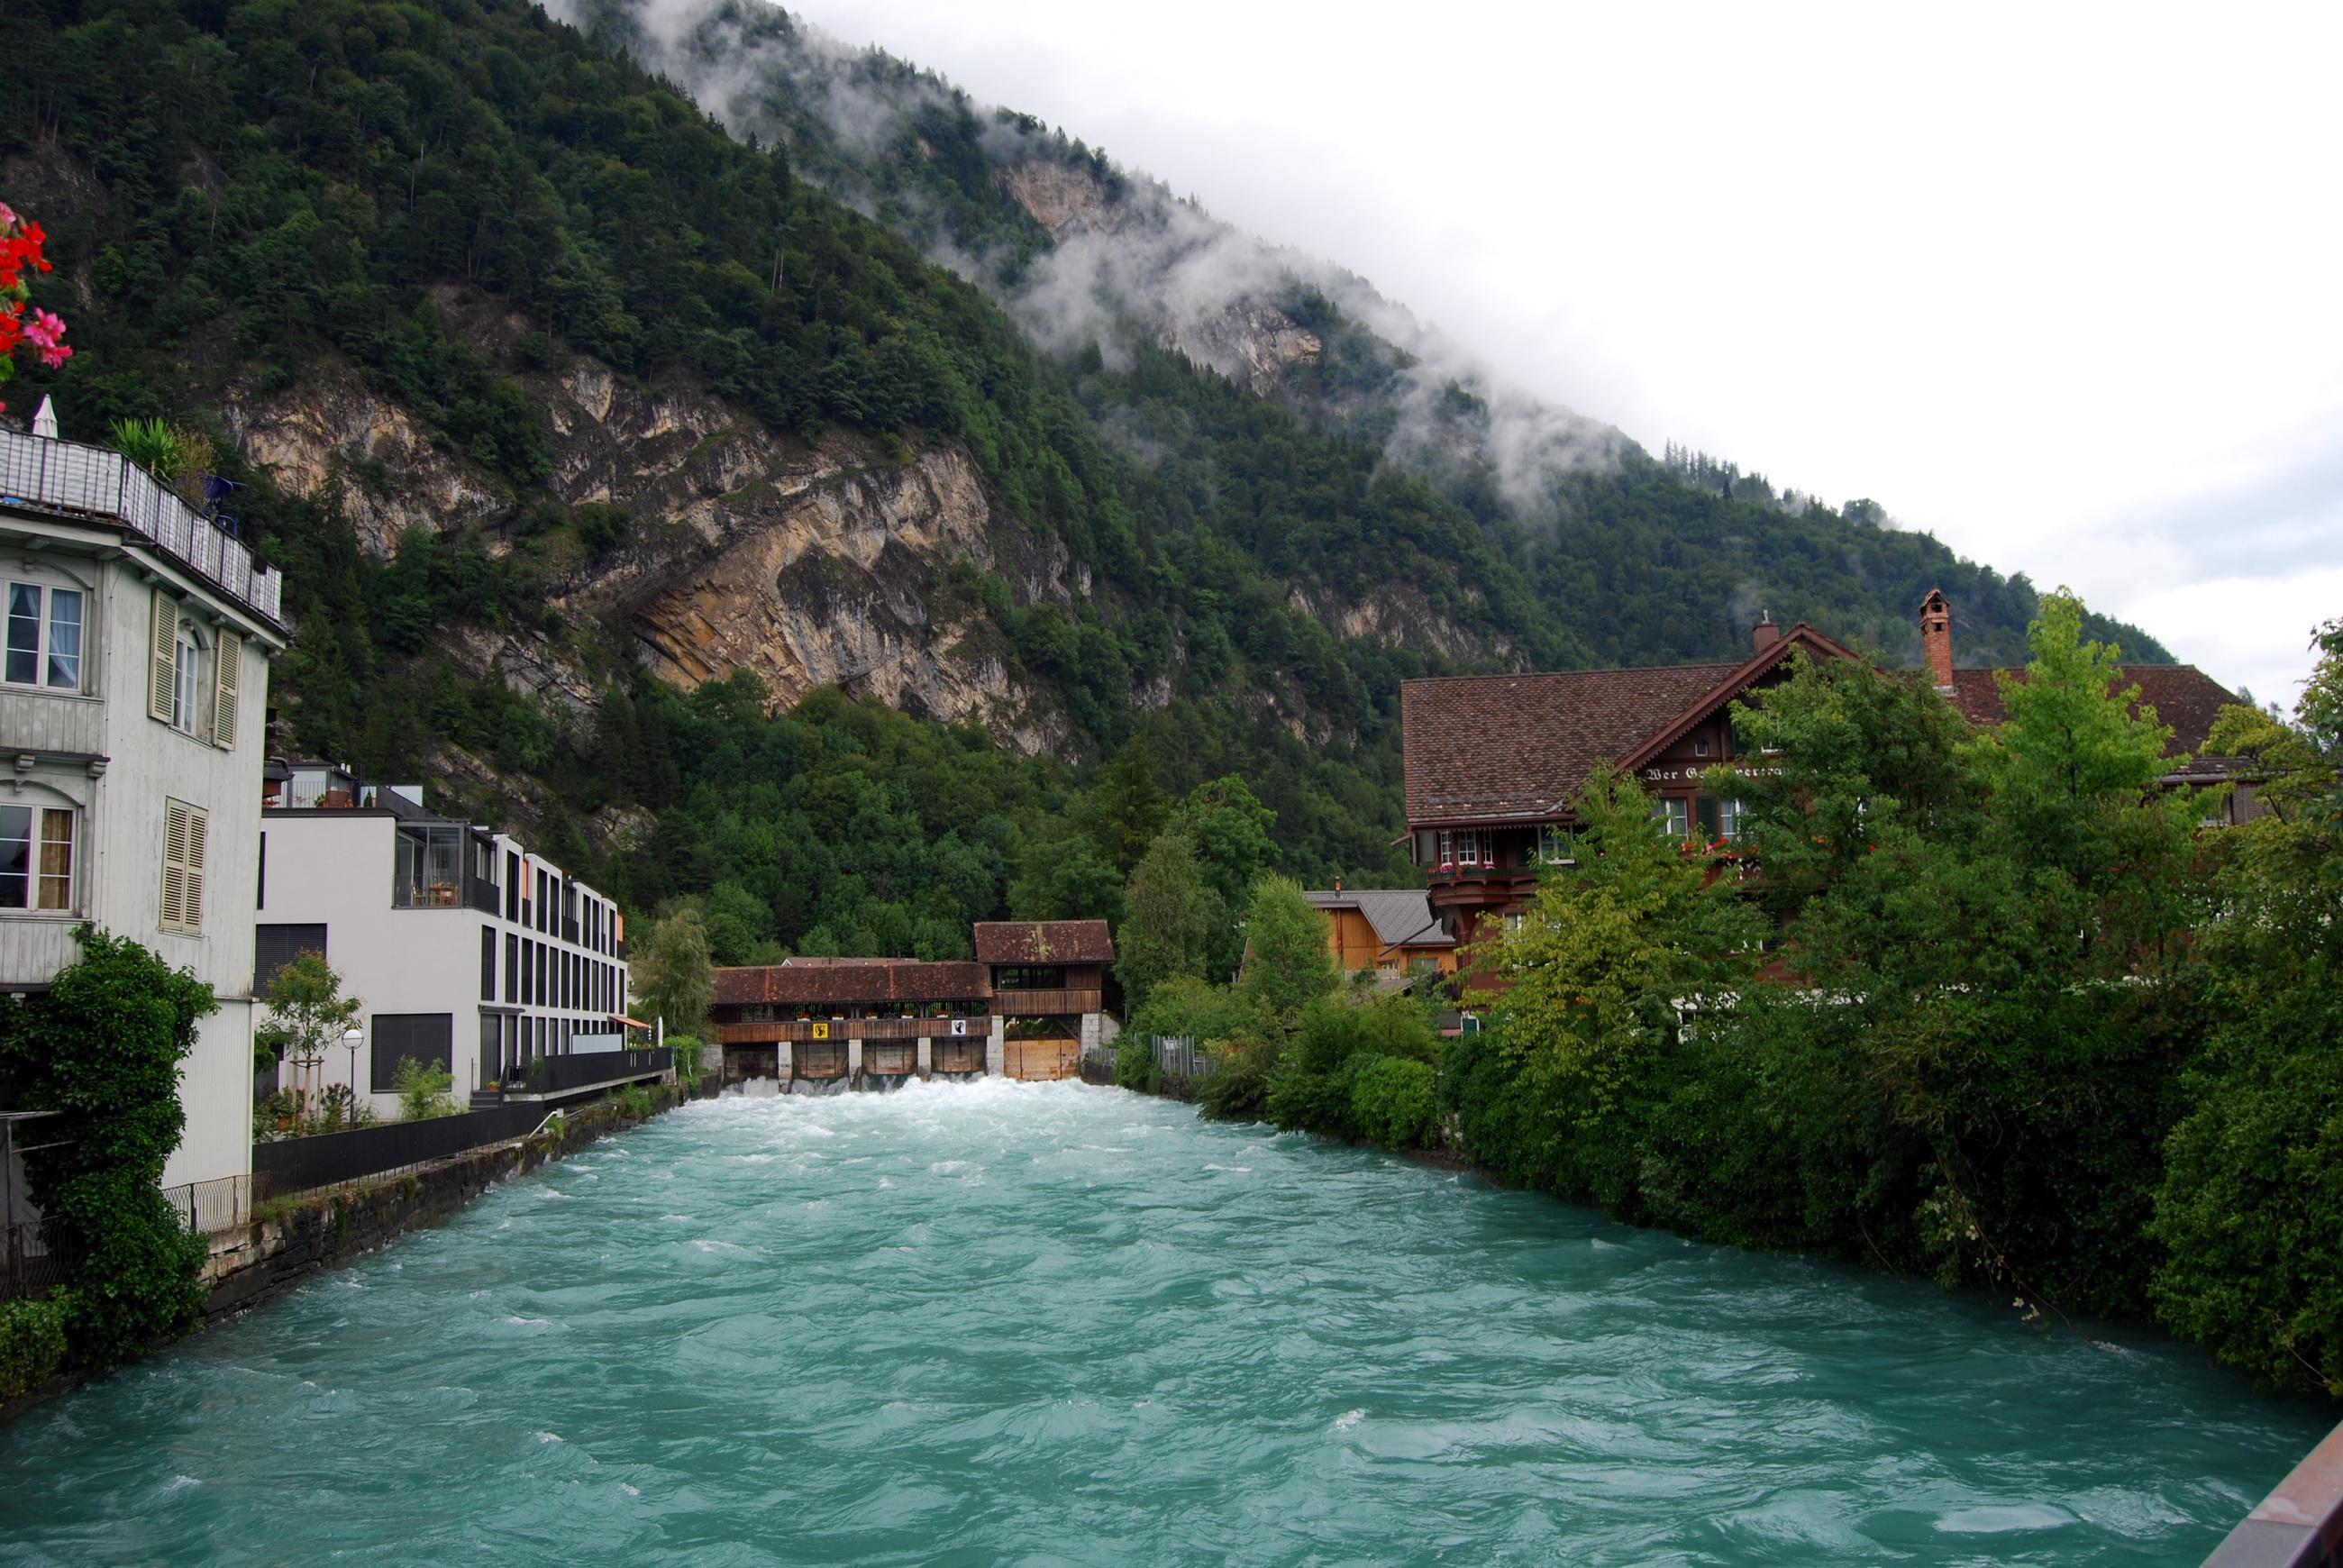 Interlaken HD Wallpaper Background Image 2600x1740 ID293916 2600x1740